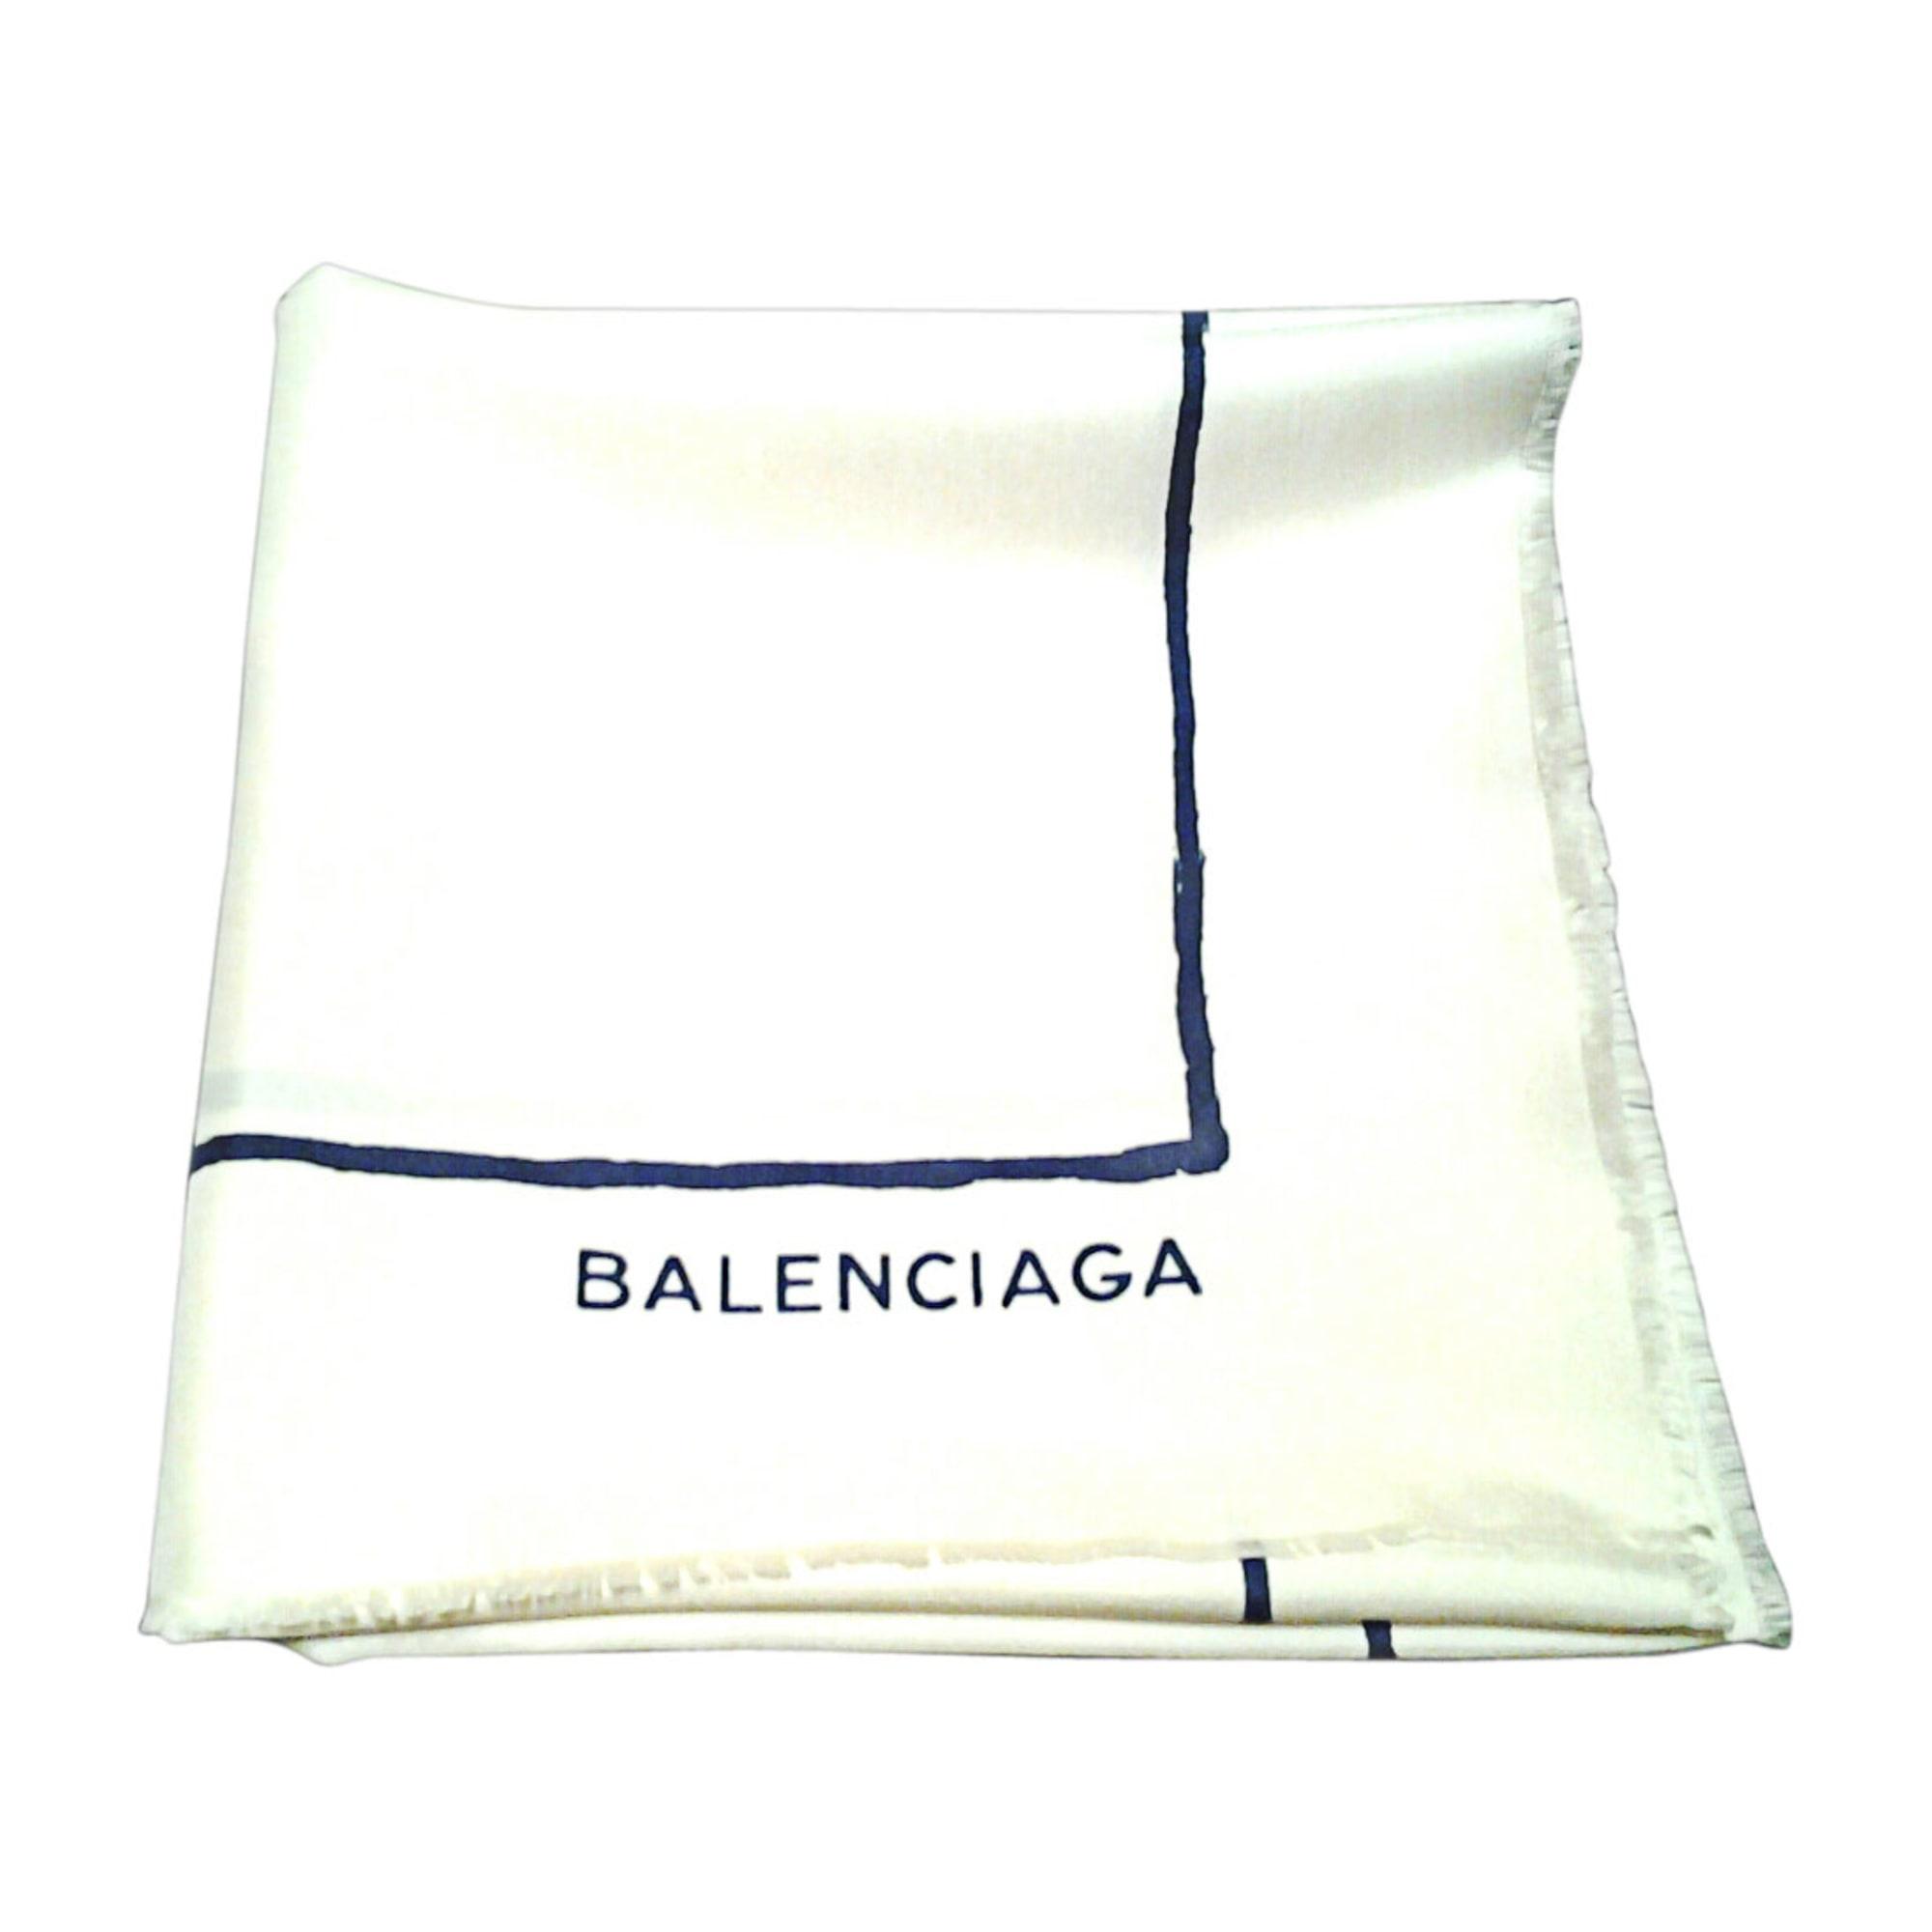 tuch schal balenciaga wei vendu par ineliah 5013554. Black Bedroom Furniture Sets. Home Design Ideas